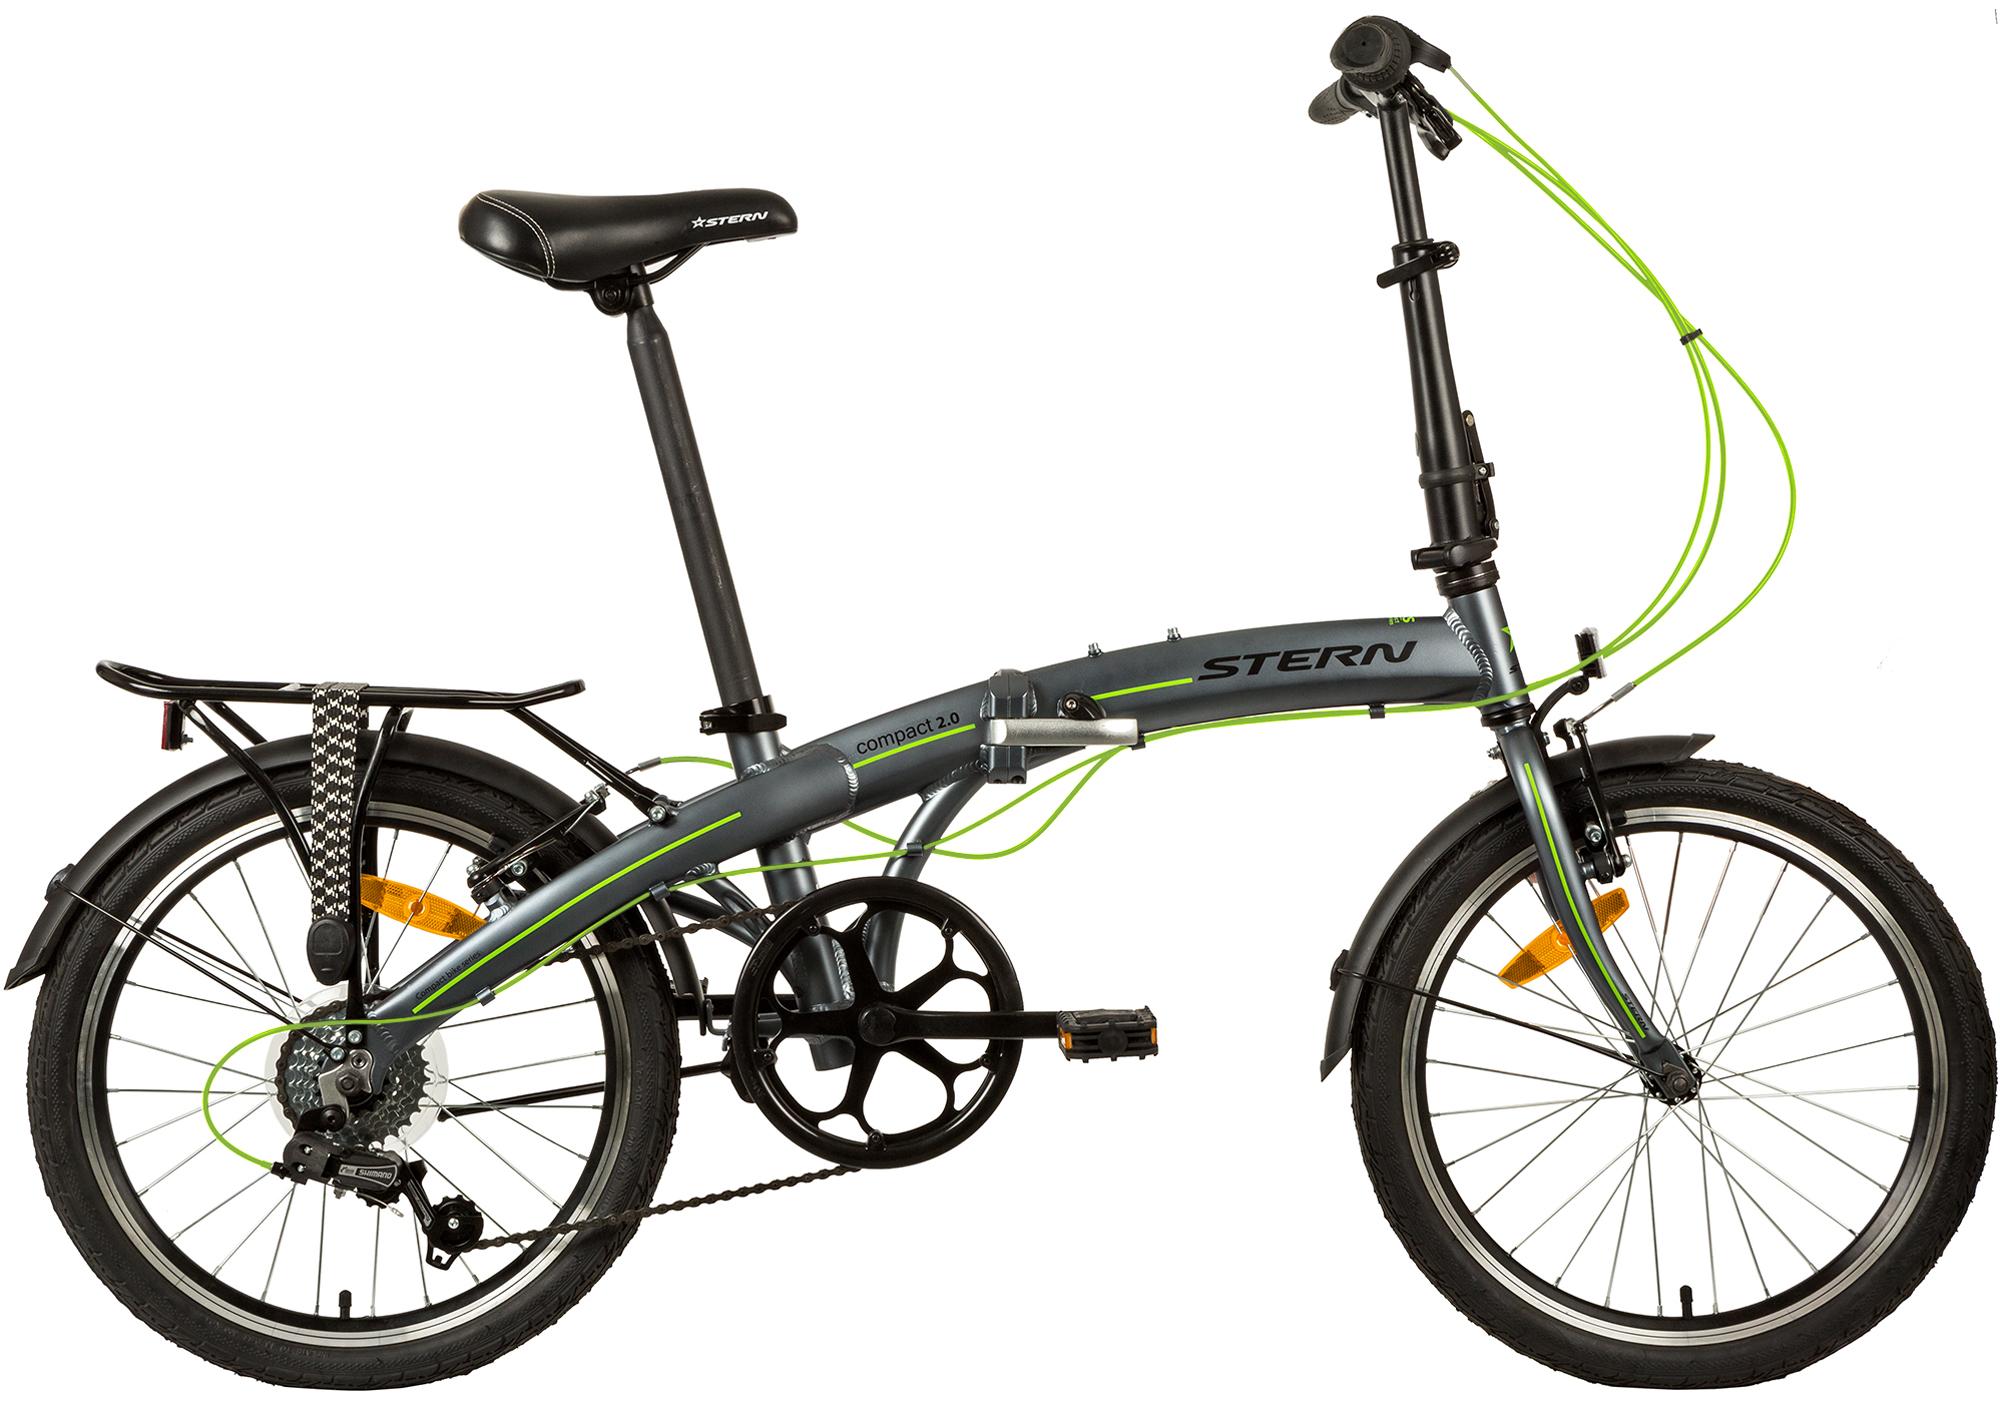 Stern Велосипед складной Stern Compact 2.0 20